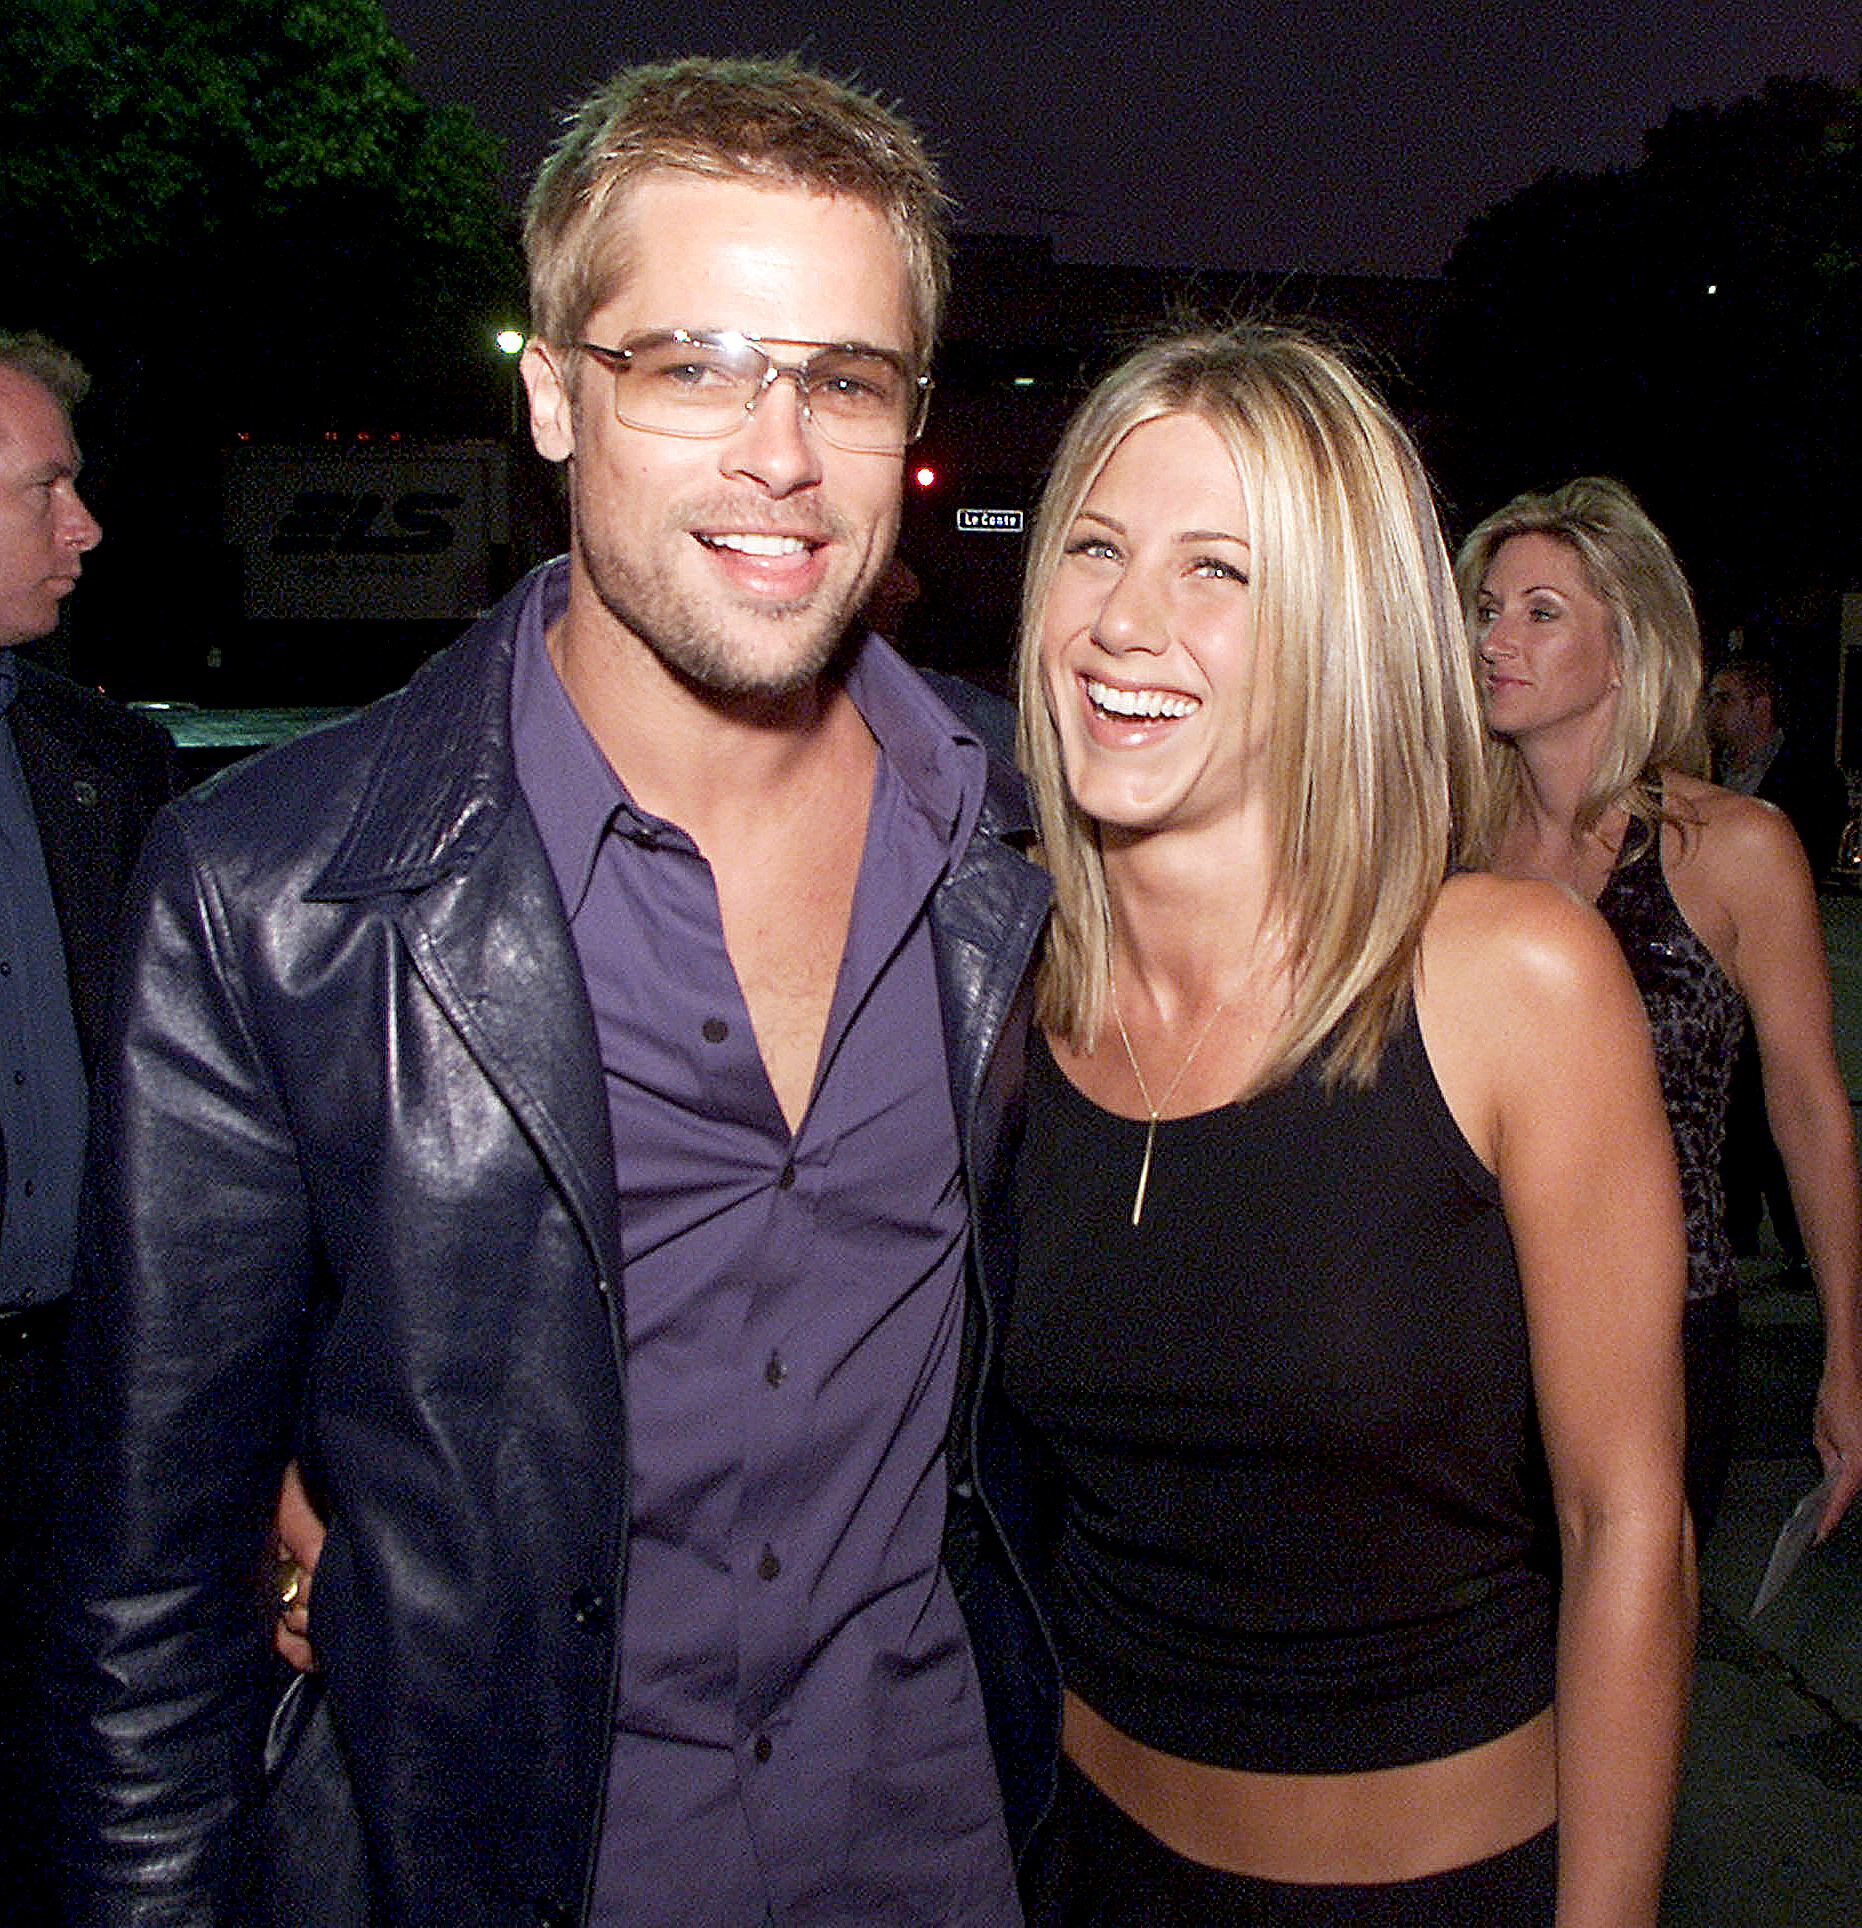 Brad-Pitt-Jennifer-Aniston-back-together-2